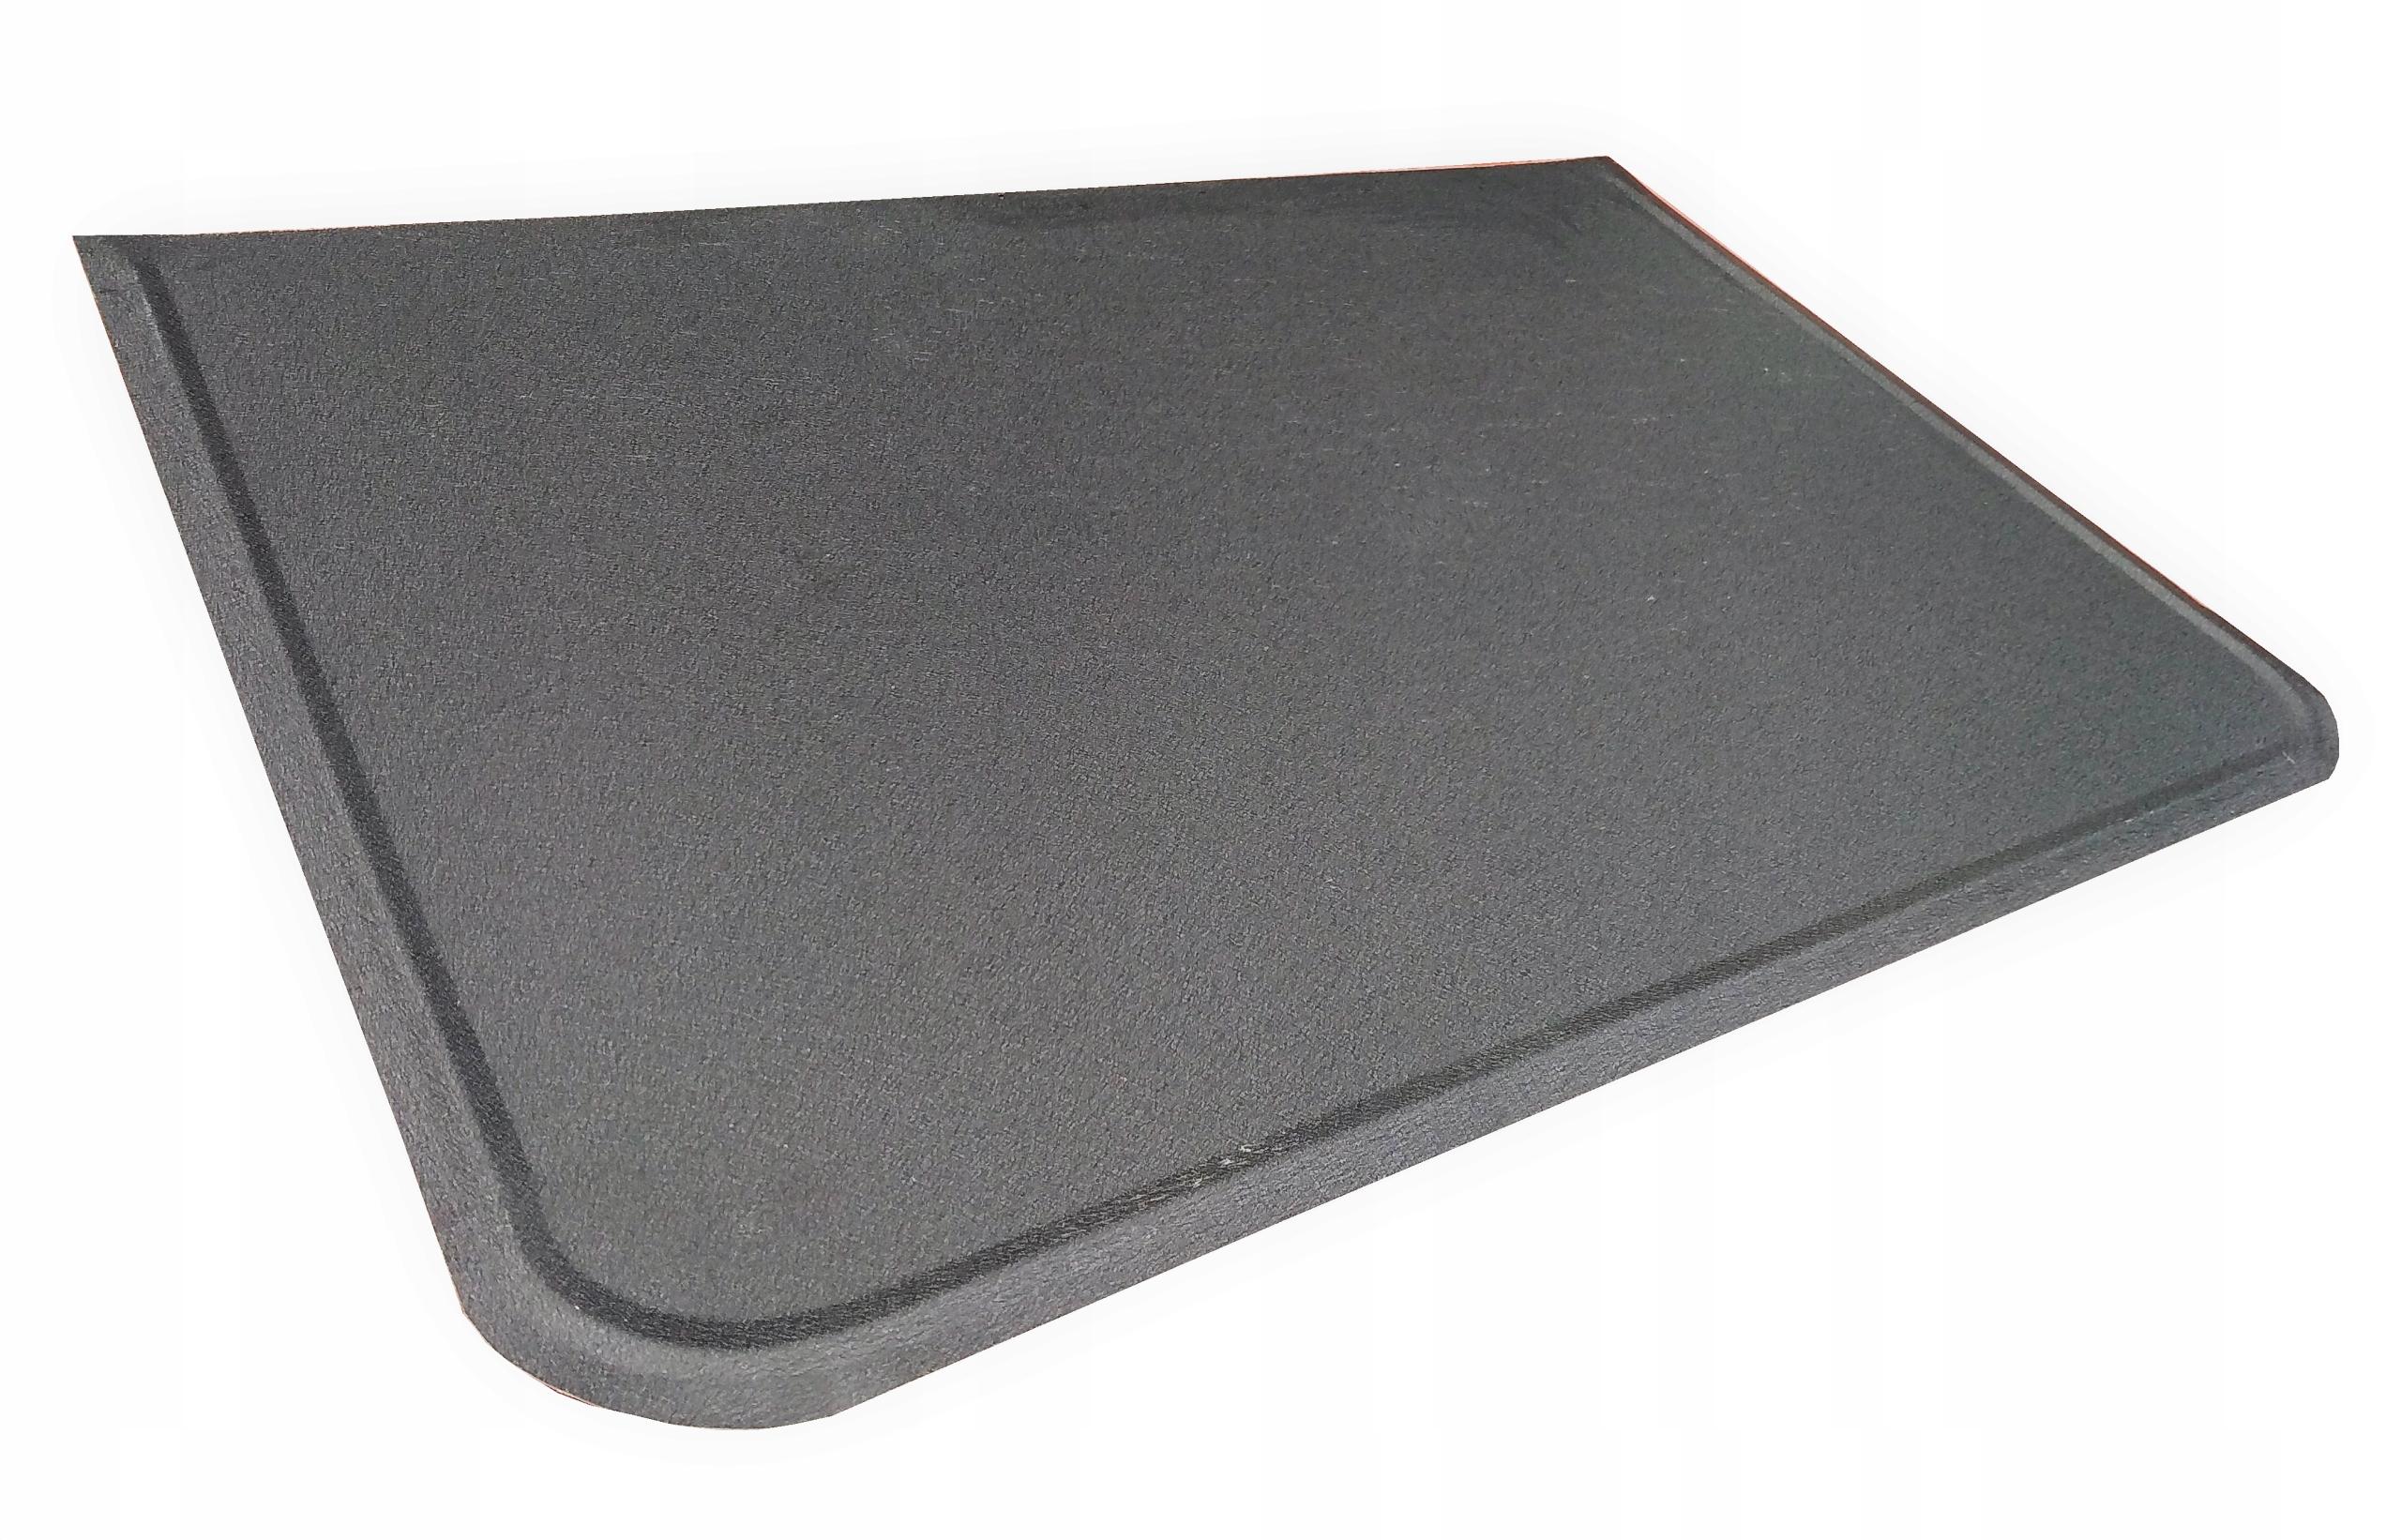 Plachta pod kachle, krb 40x80 čierna